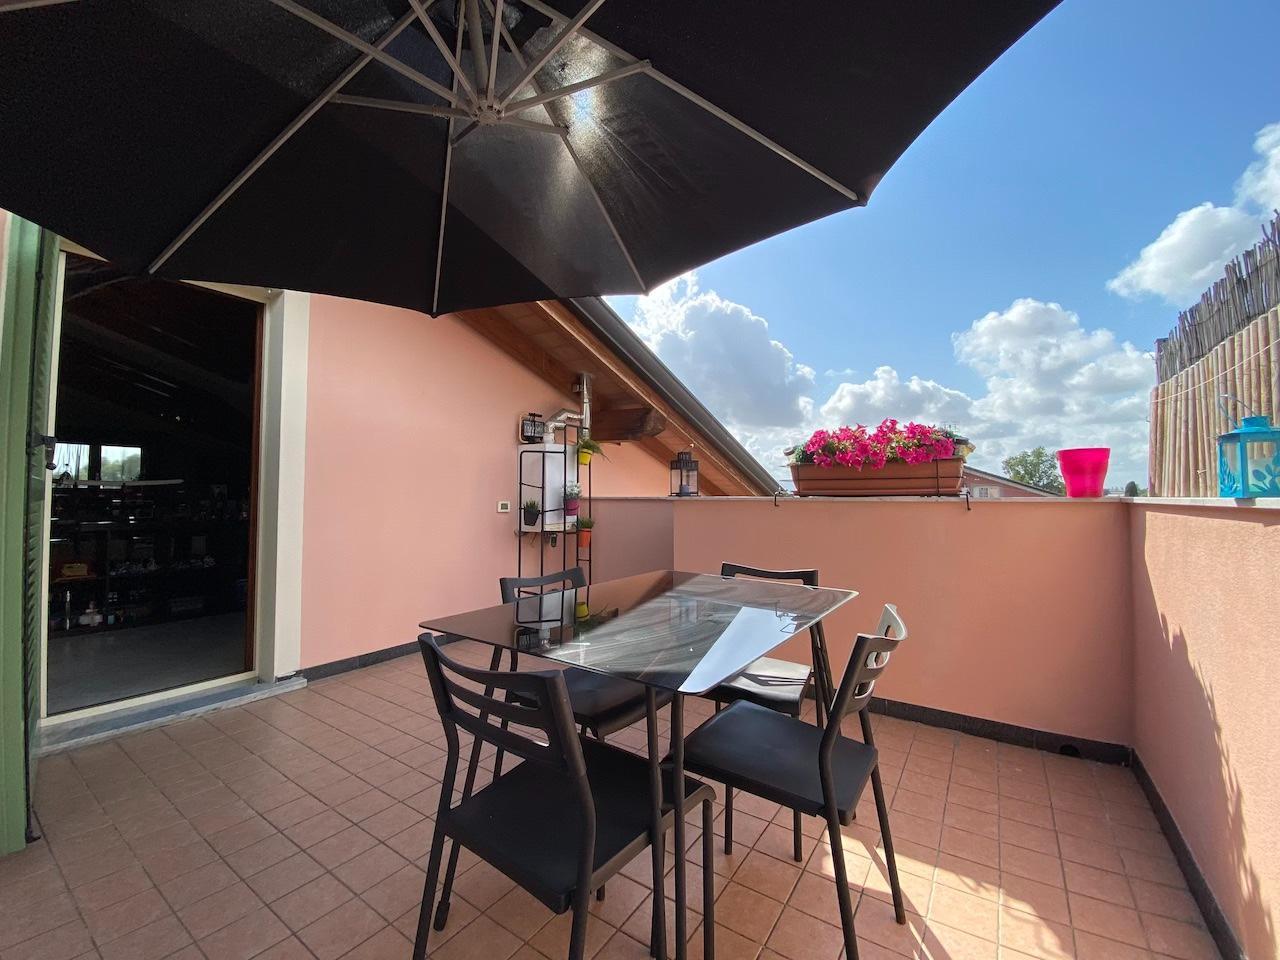 Appartamento in vendita, rif. LOG-458